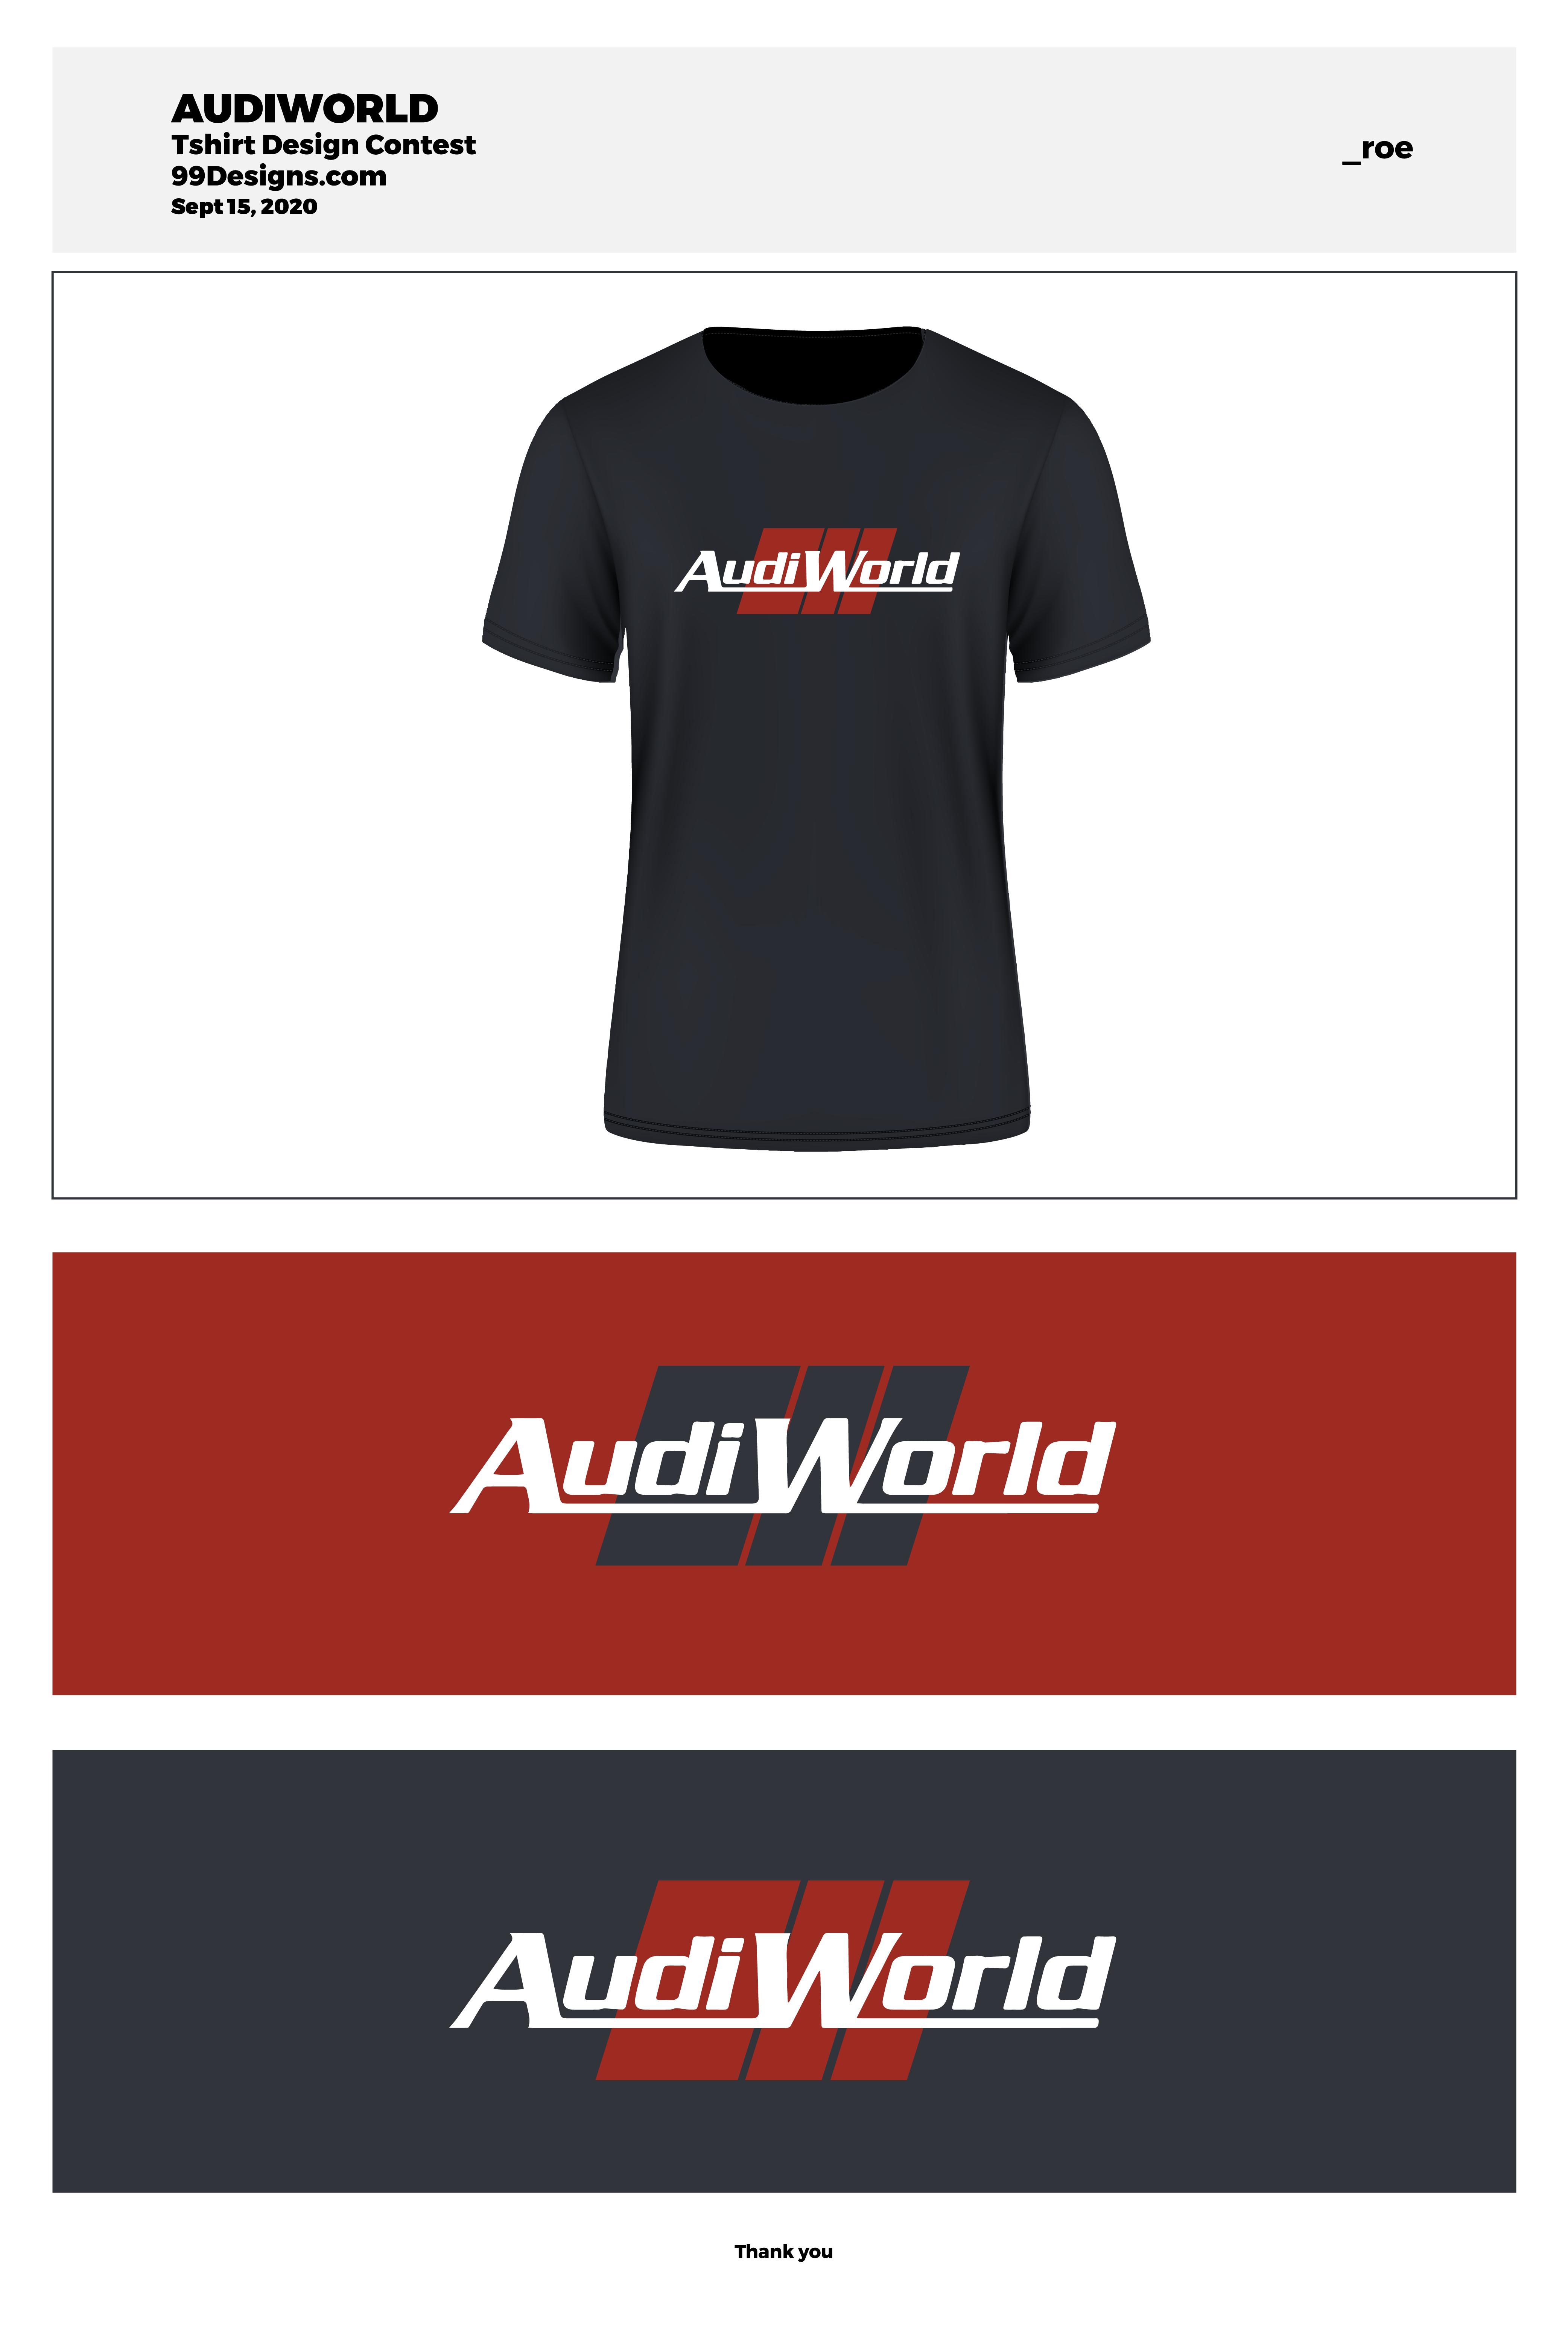 AudiWorld Premium Membership T-Shirt Contest